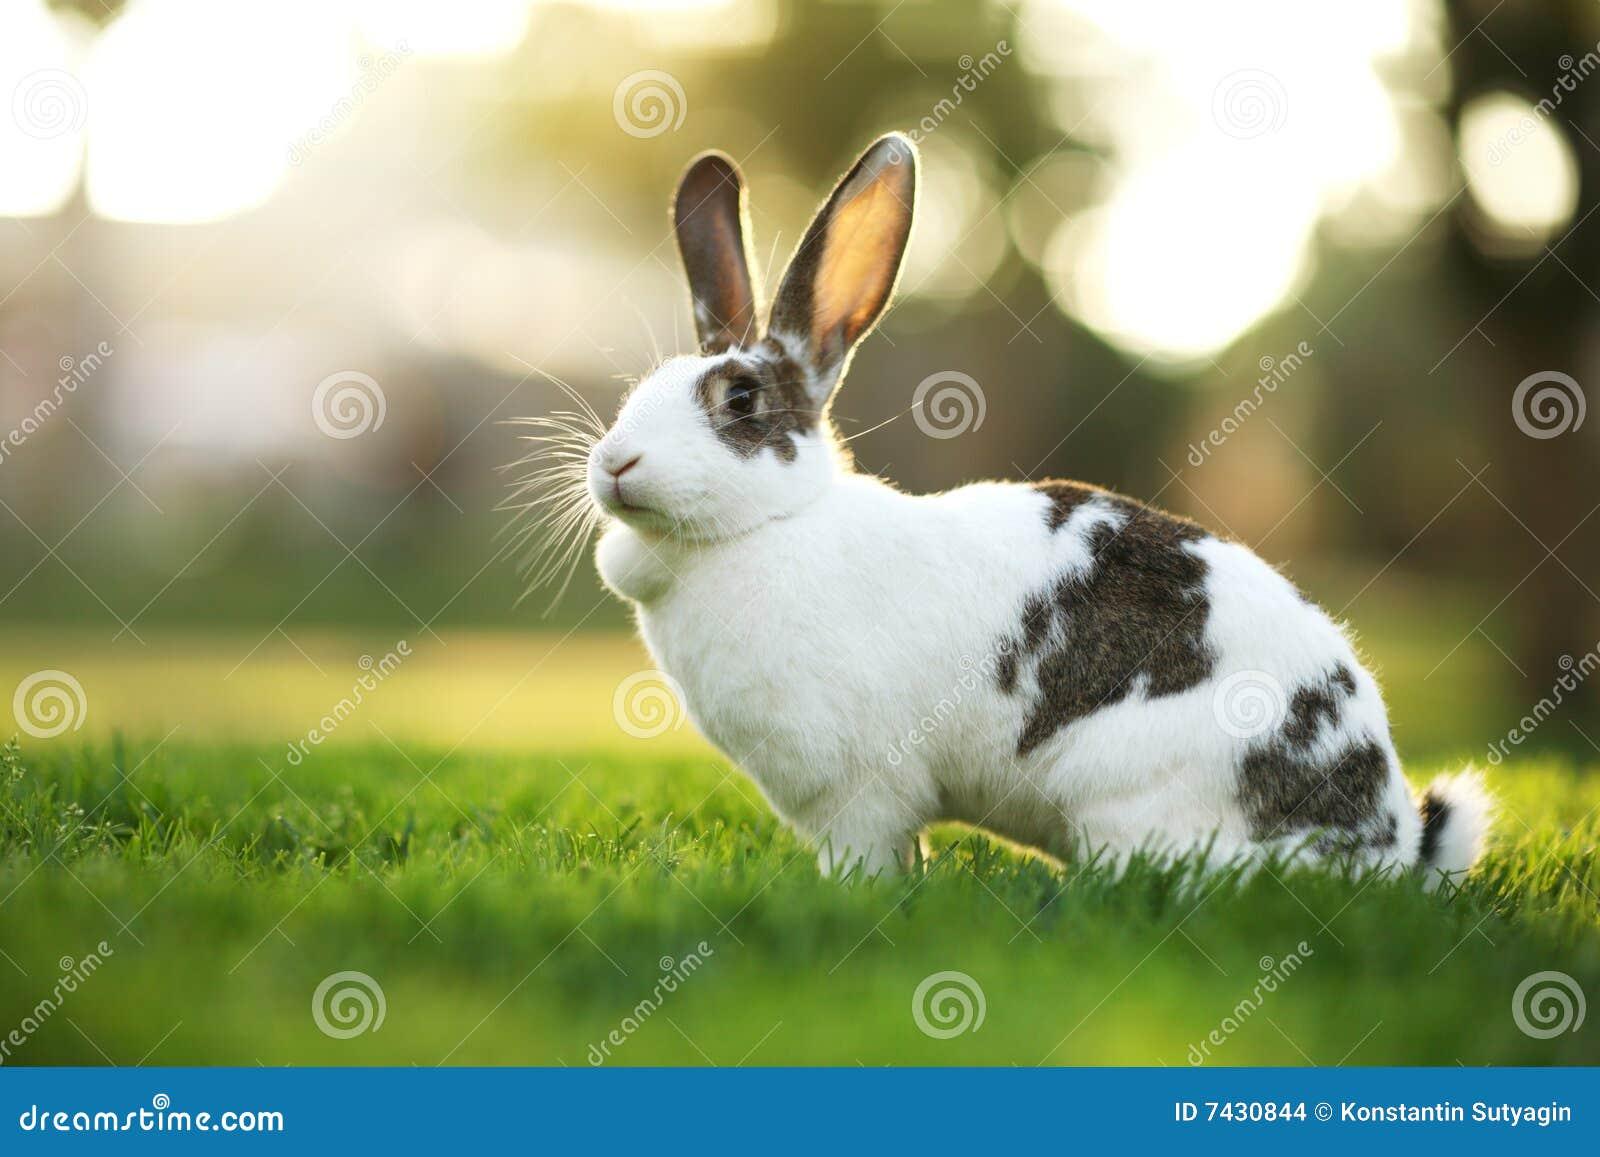 Rabbit on grass